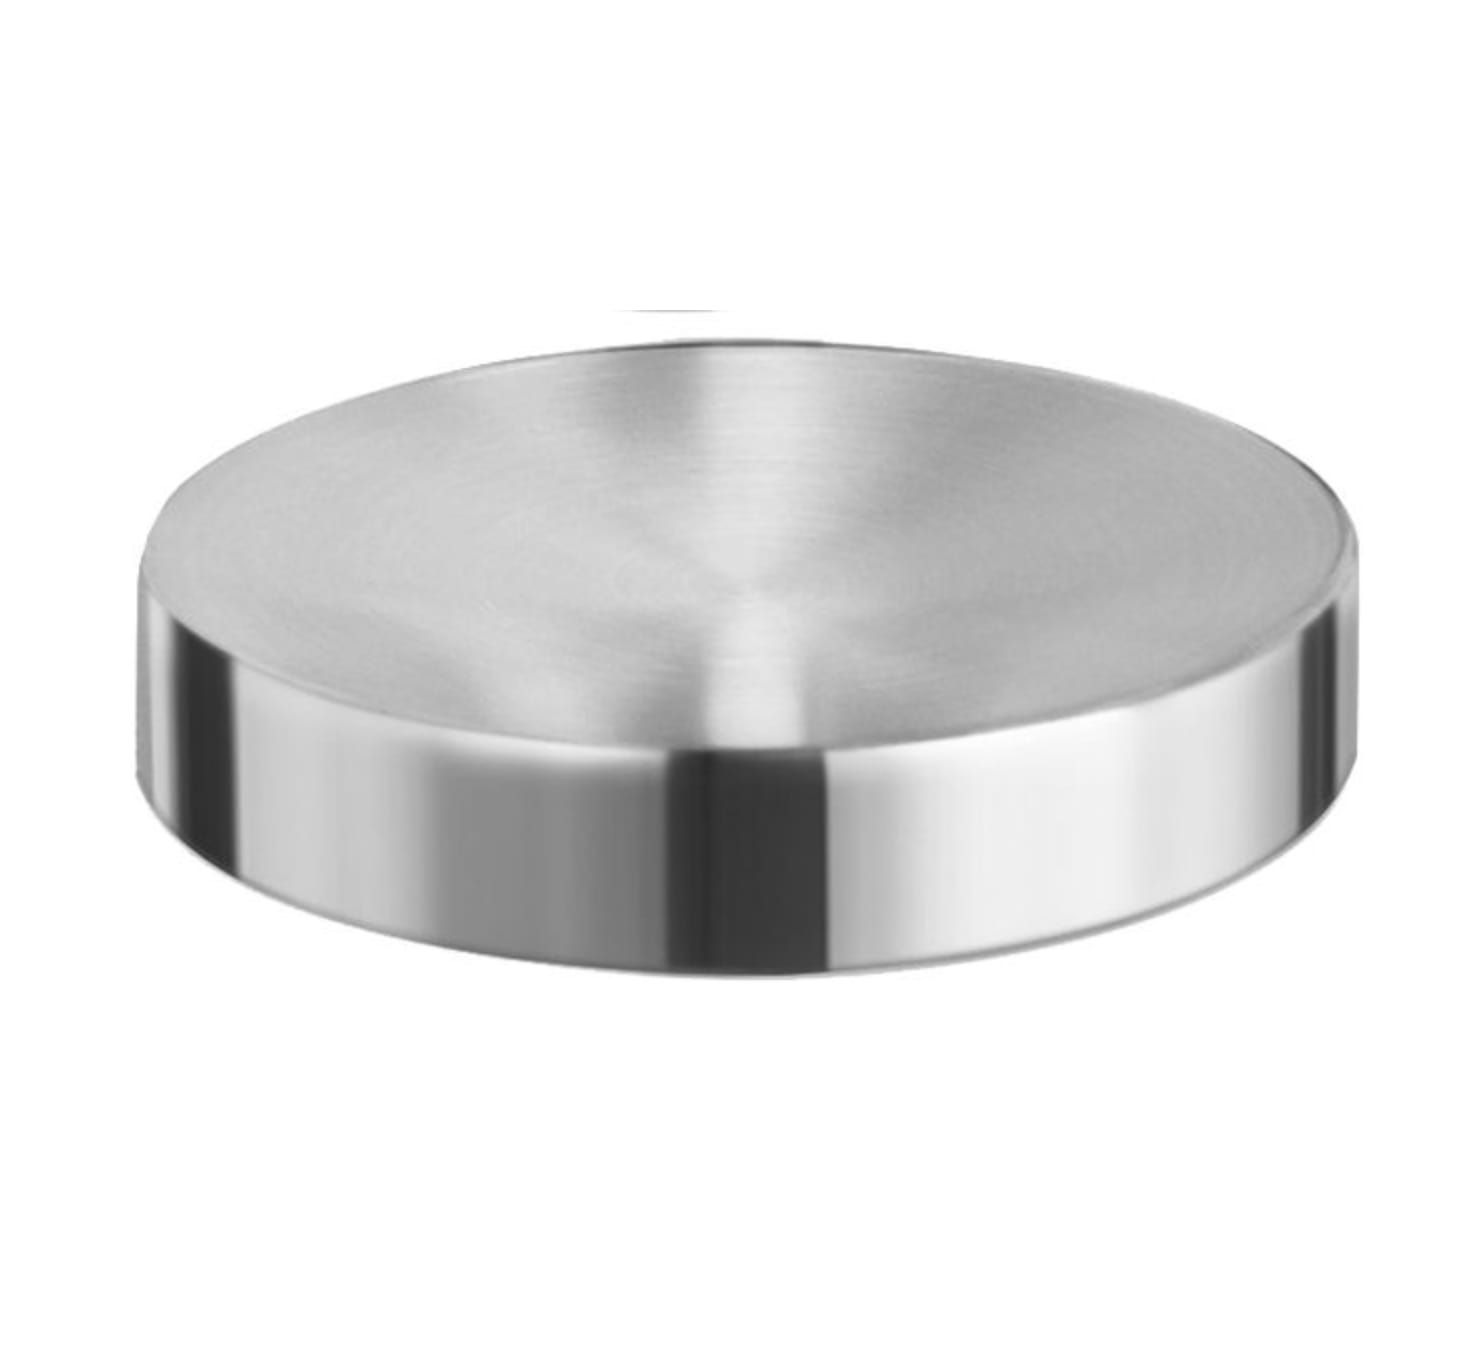 Porte-savon chrome brillant D11cm